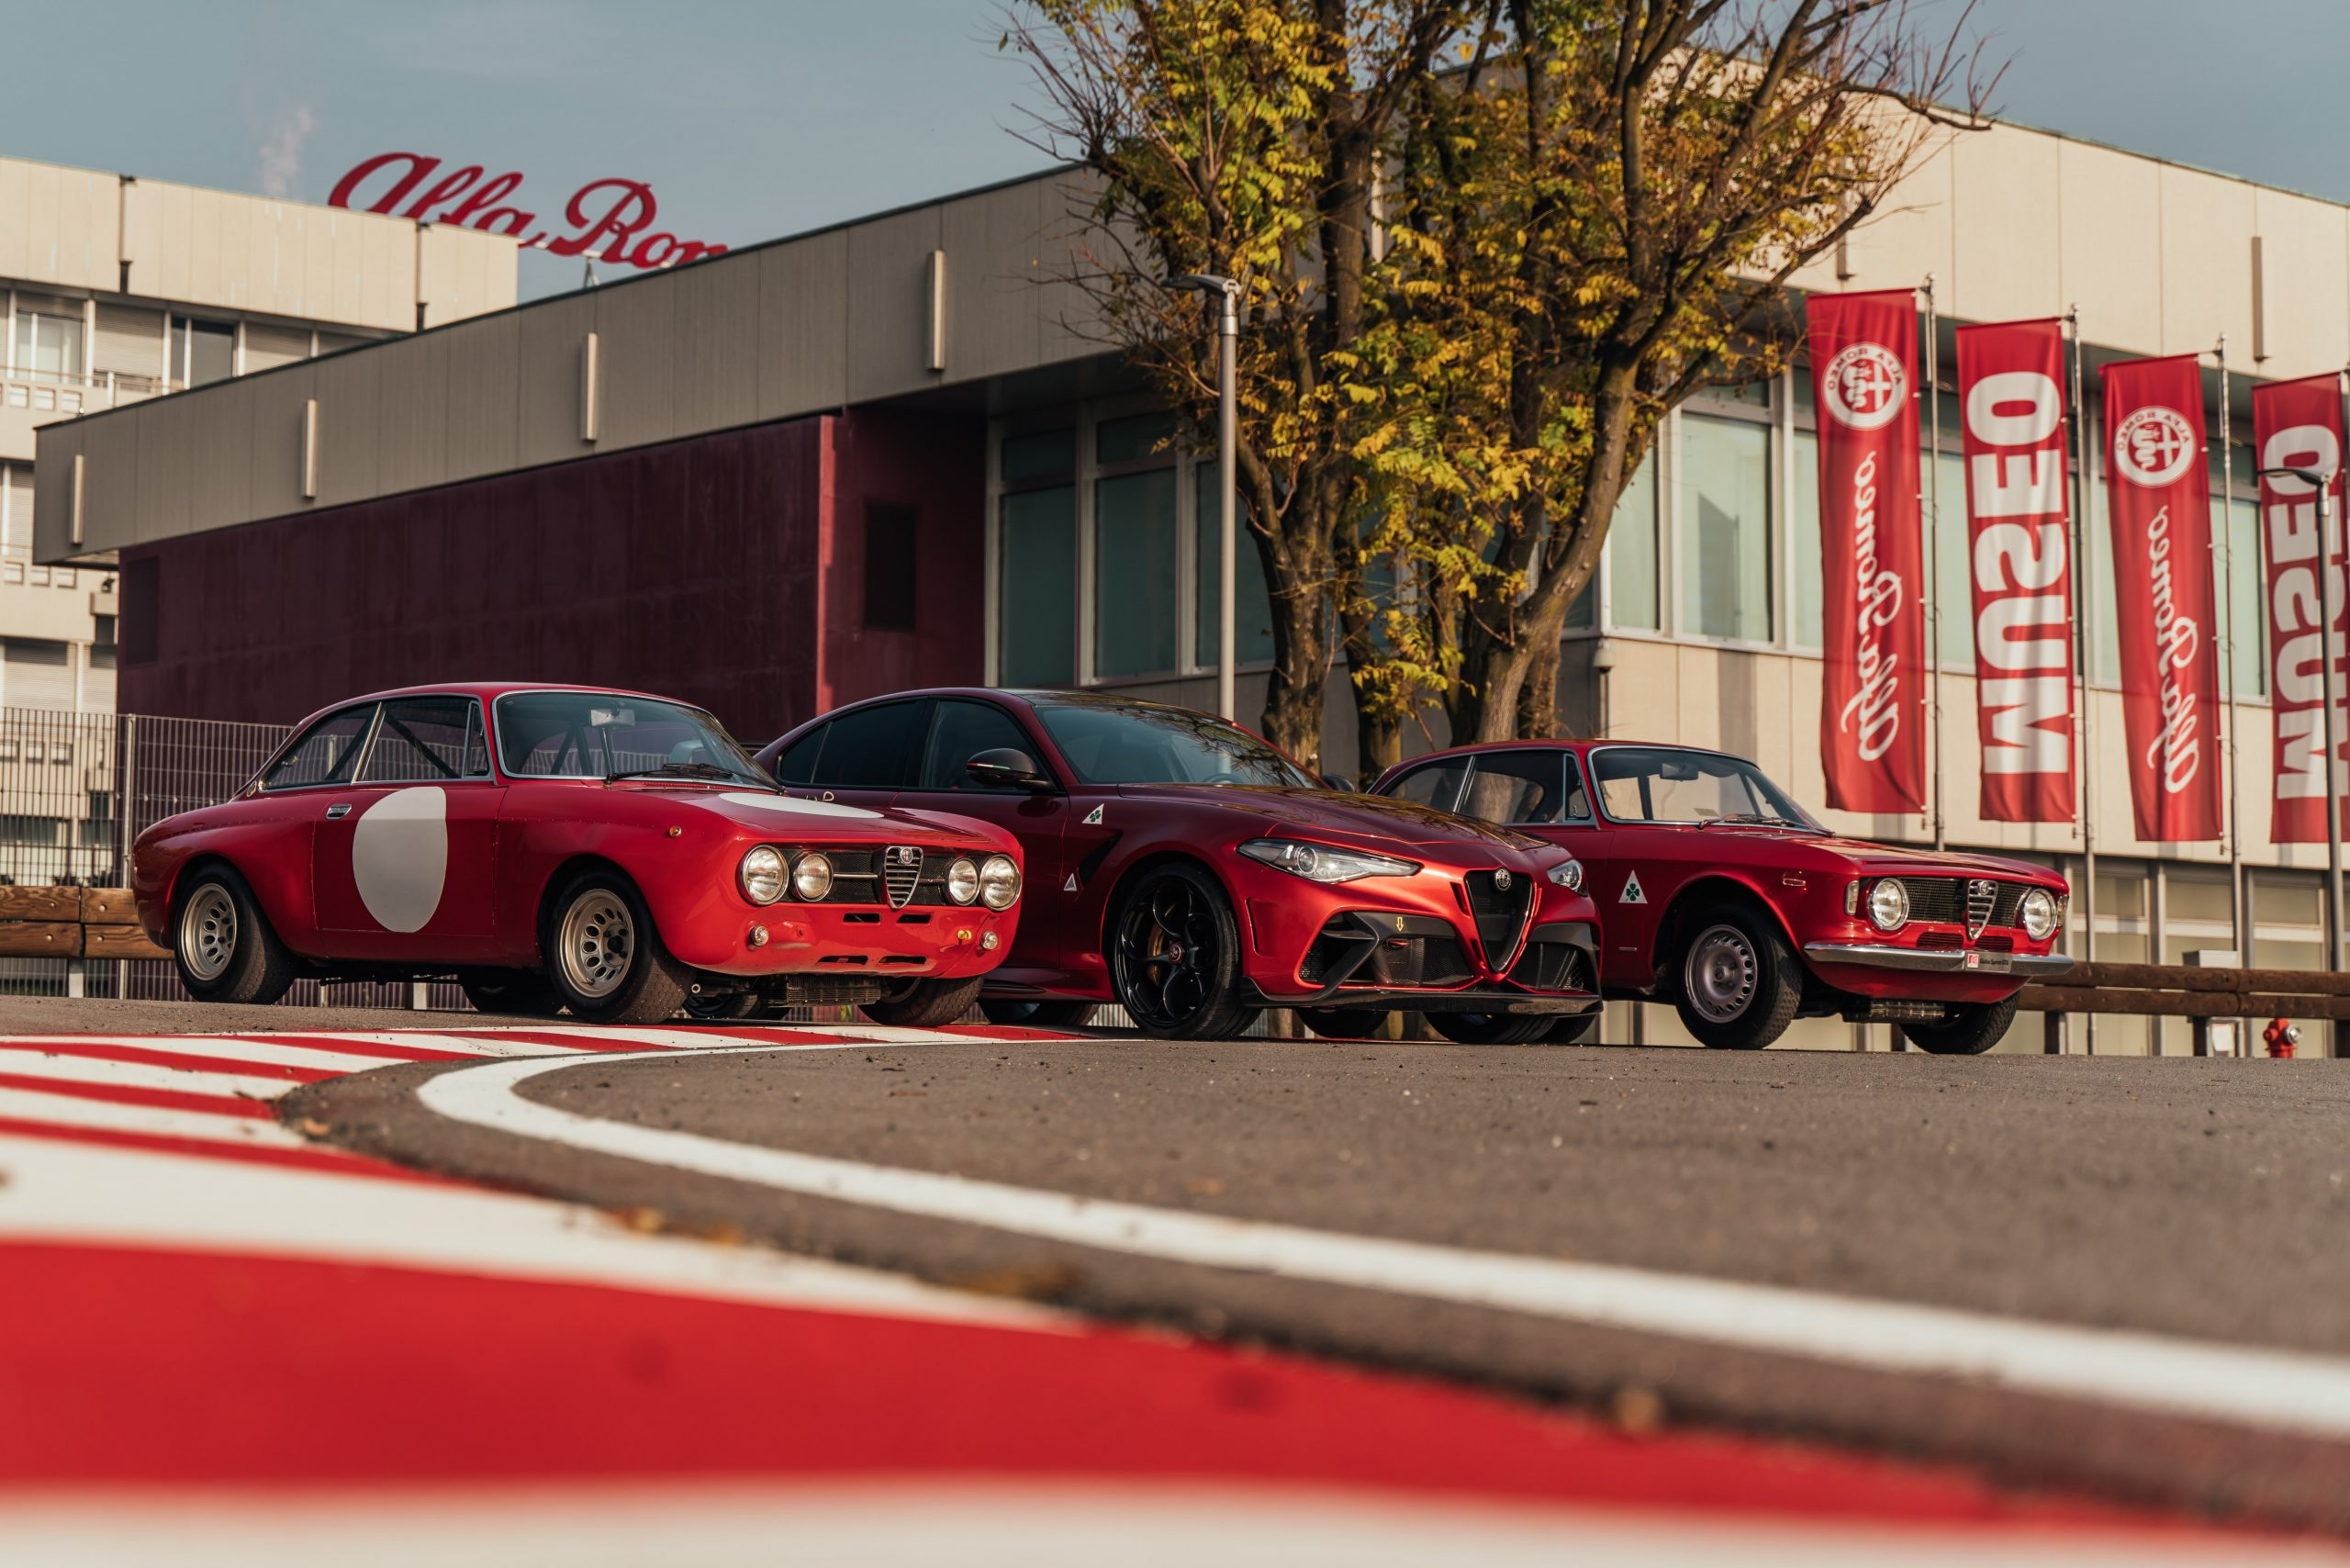 210610 AR 111 Anniversary 02 scaled H Alfa Romeo προσκαλεί τους Alfisti για τα 111α γενέθλια της Alfa, alfa romeo, Alfa Romeo Giulia, Alfa Romeo Giulia GTA, Alfa Romeo Giulia GTAm, ειδήσεις, Νέα